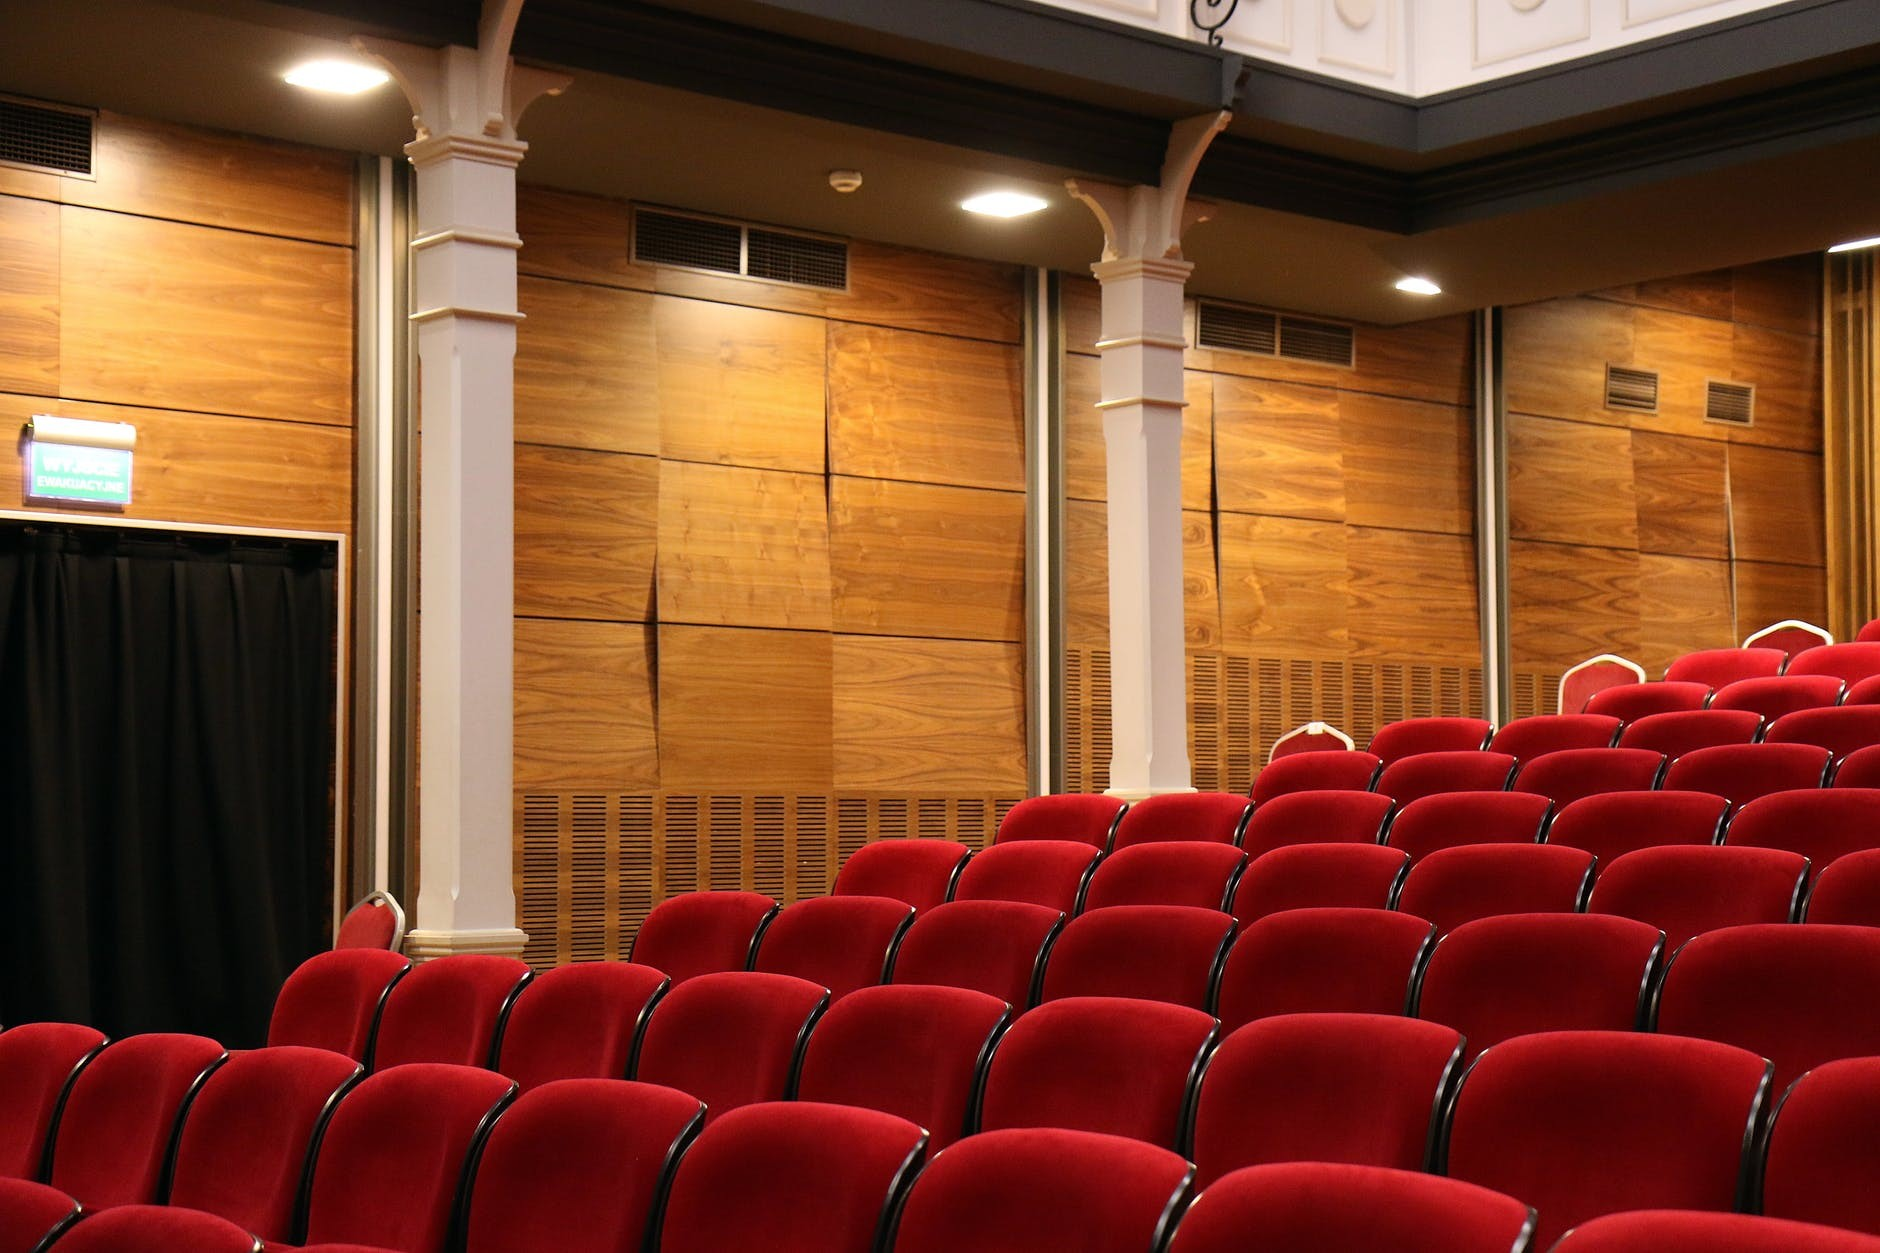 auditorium-chairs-concert-music-hall